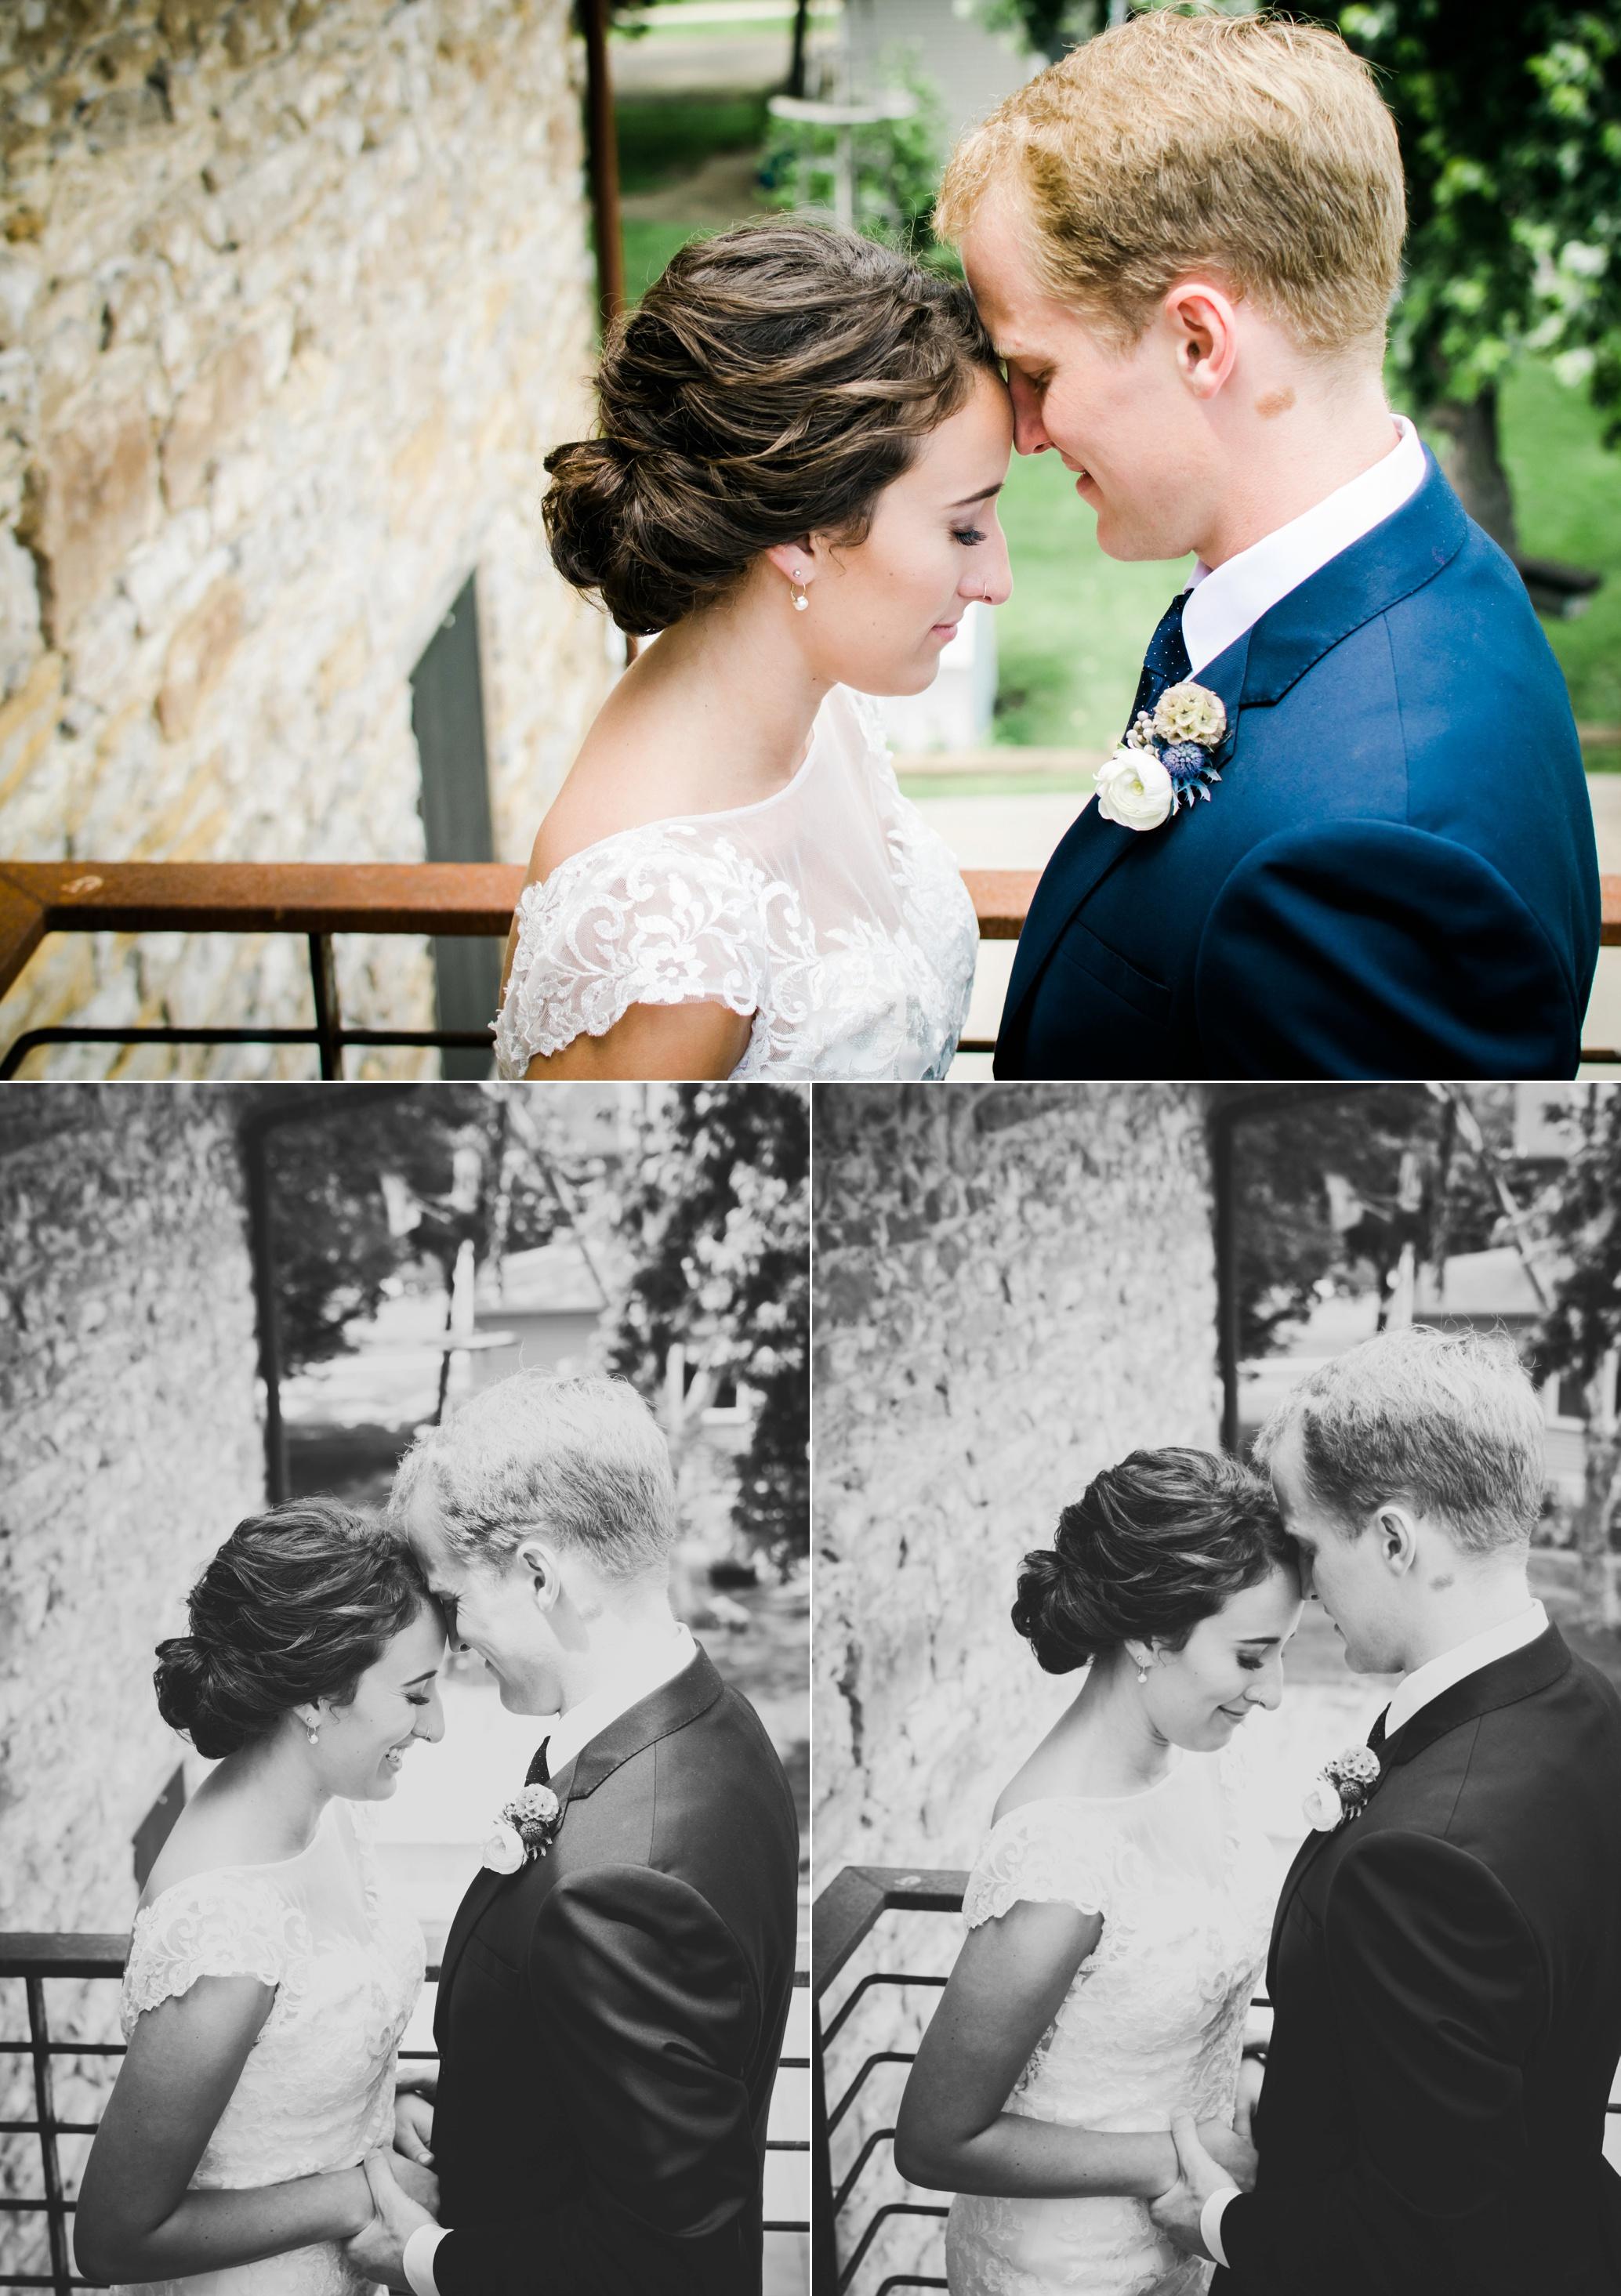 Palmer House and Stable Solon, IA | Ali Leigh Photo Minneapolis Wedding Photographer_0264.jpg